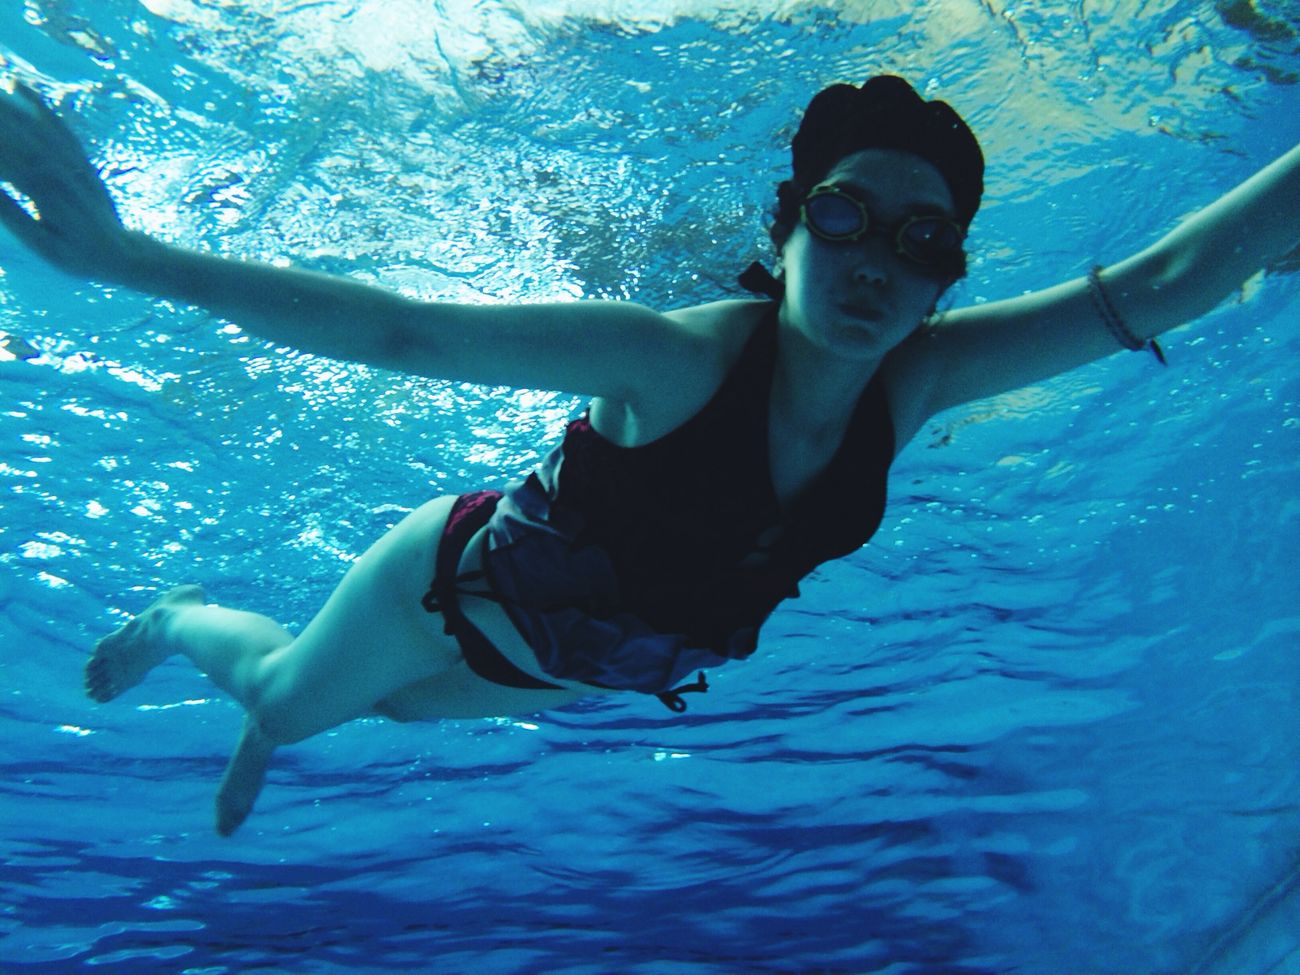 Swimming Hello World That's Me EyeEm Best Shots Life Swimming Pool